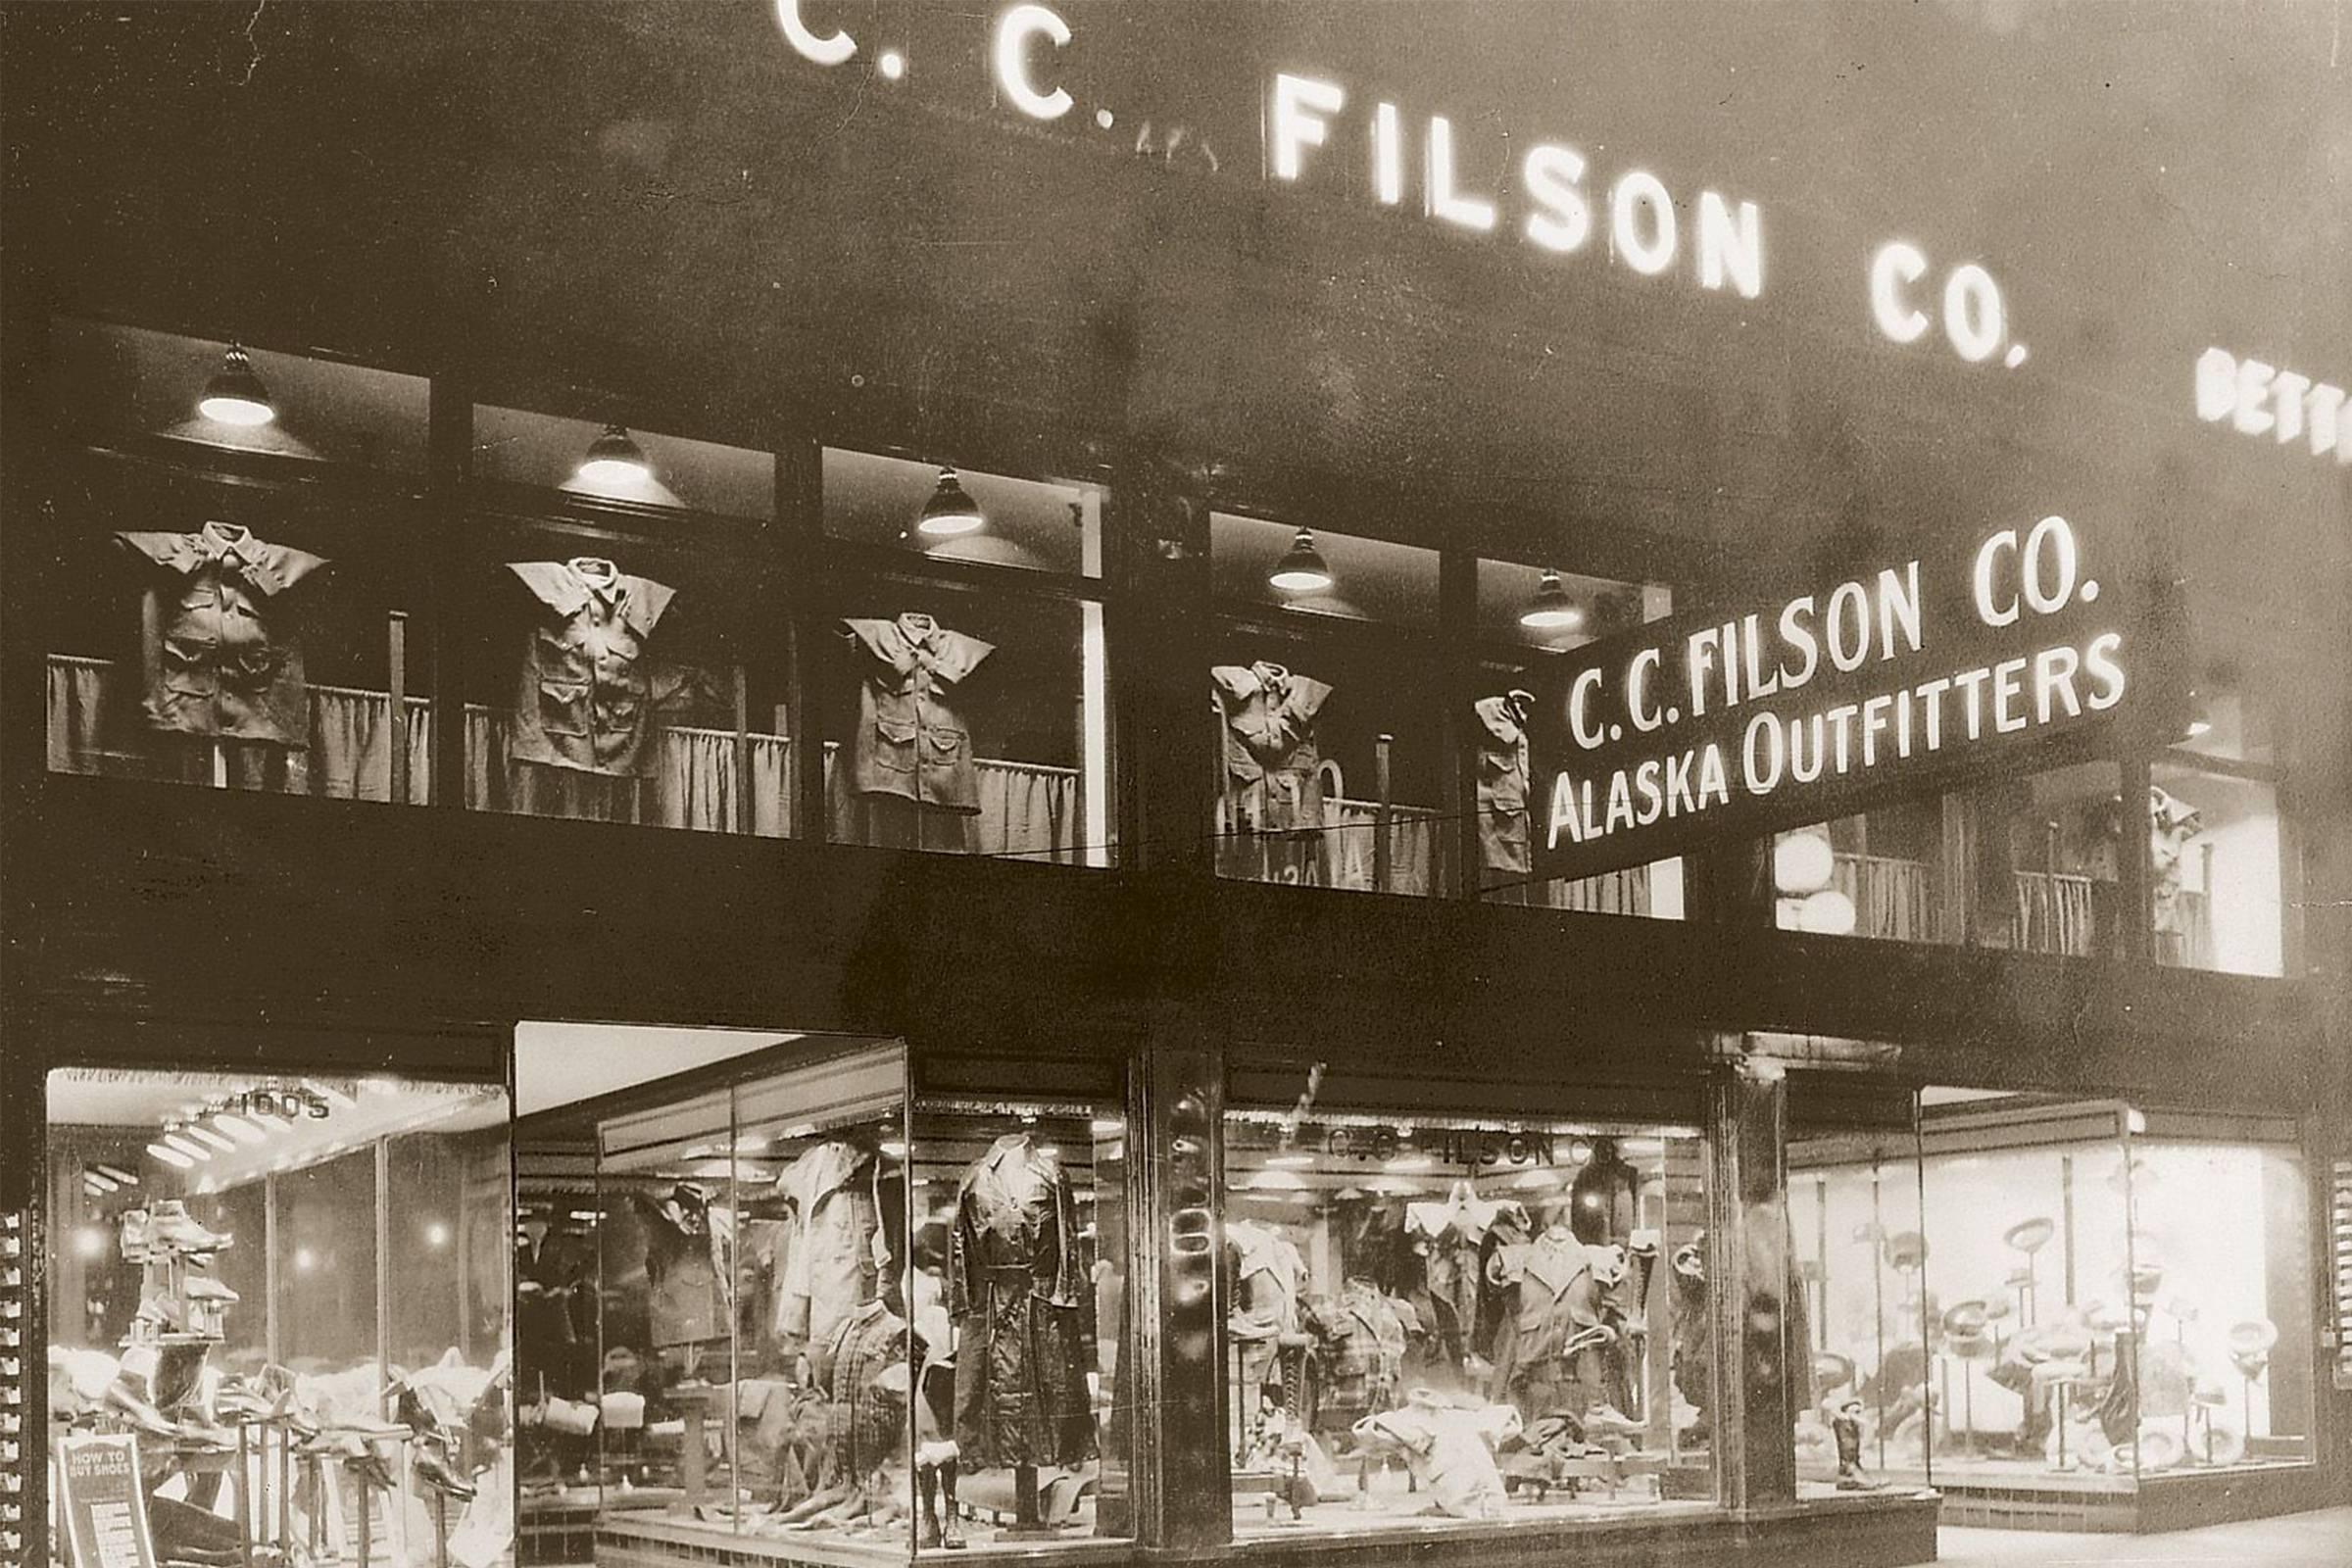 The original Filson store in Seattle (c. 1910)